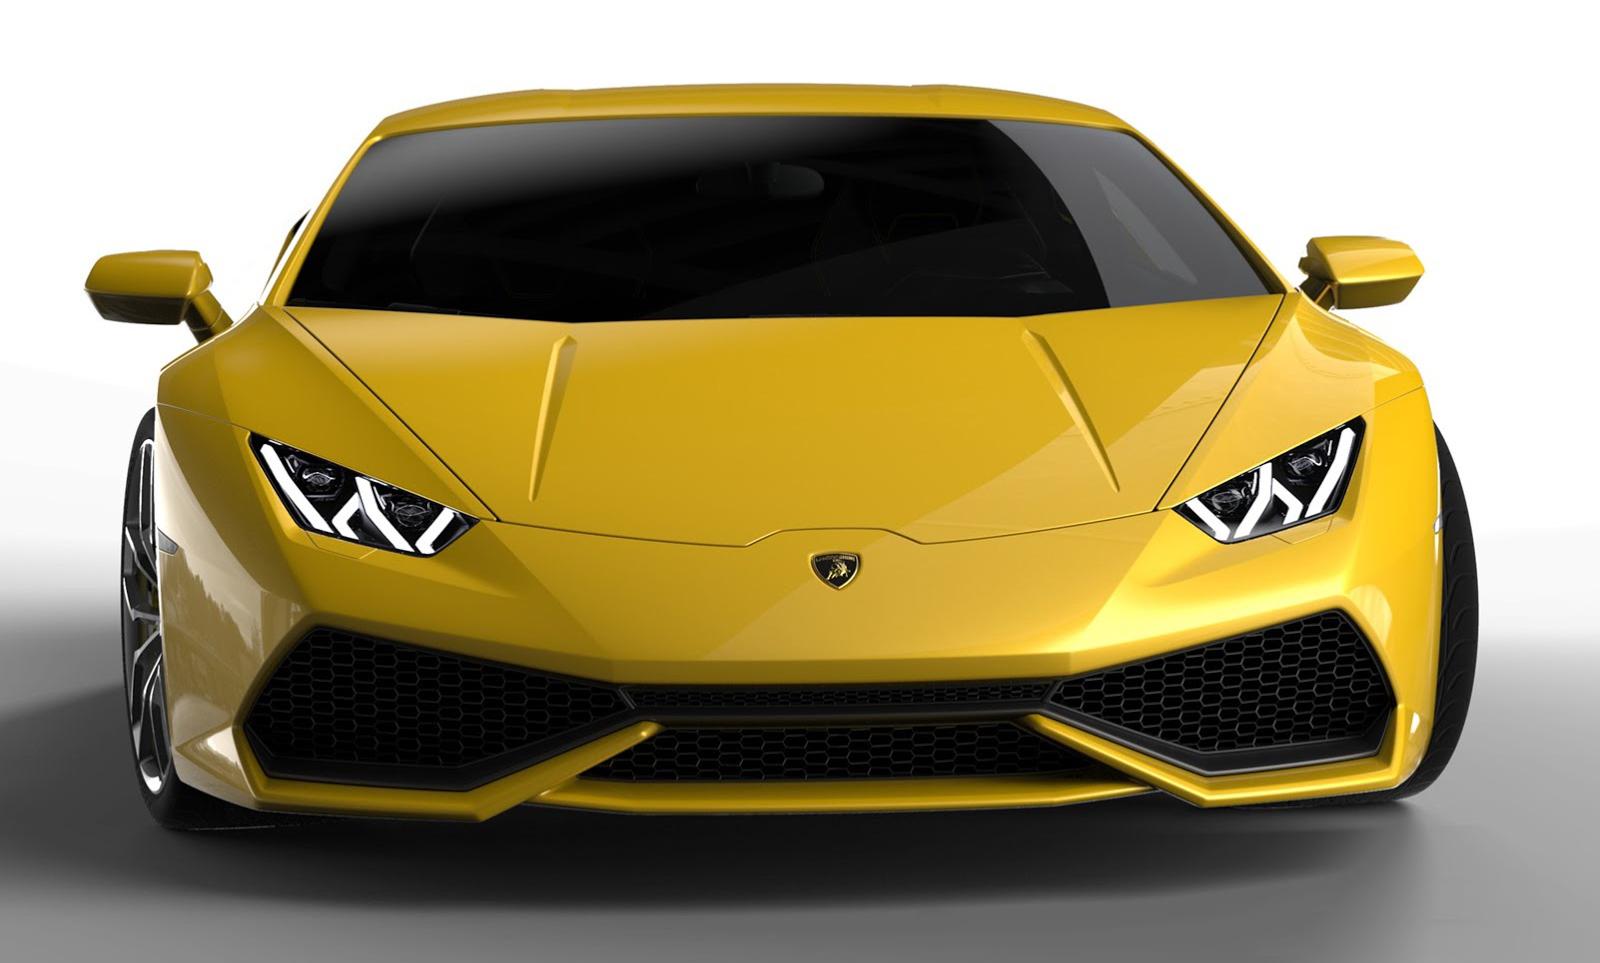 Lamborghini Huracan Lp 610 4 Replaces The Gallardo